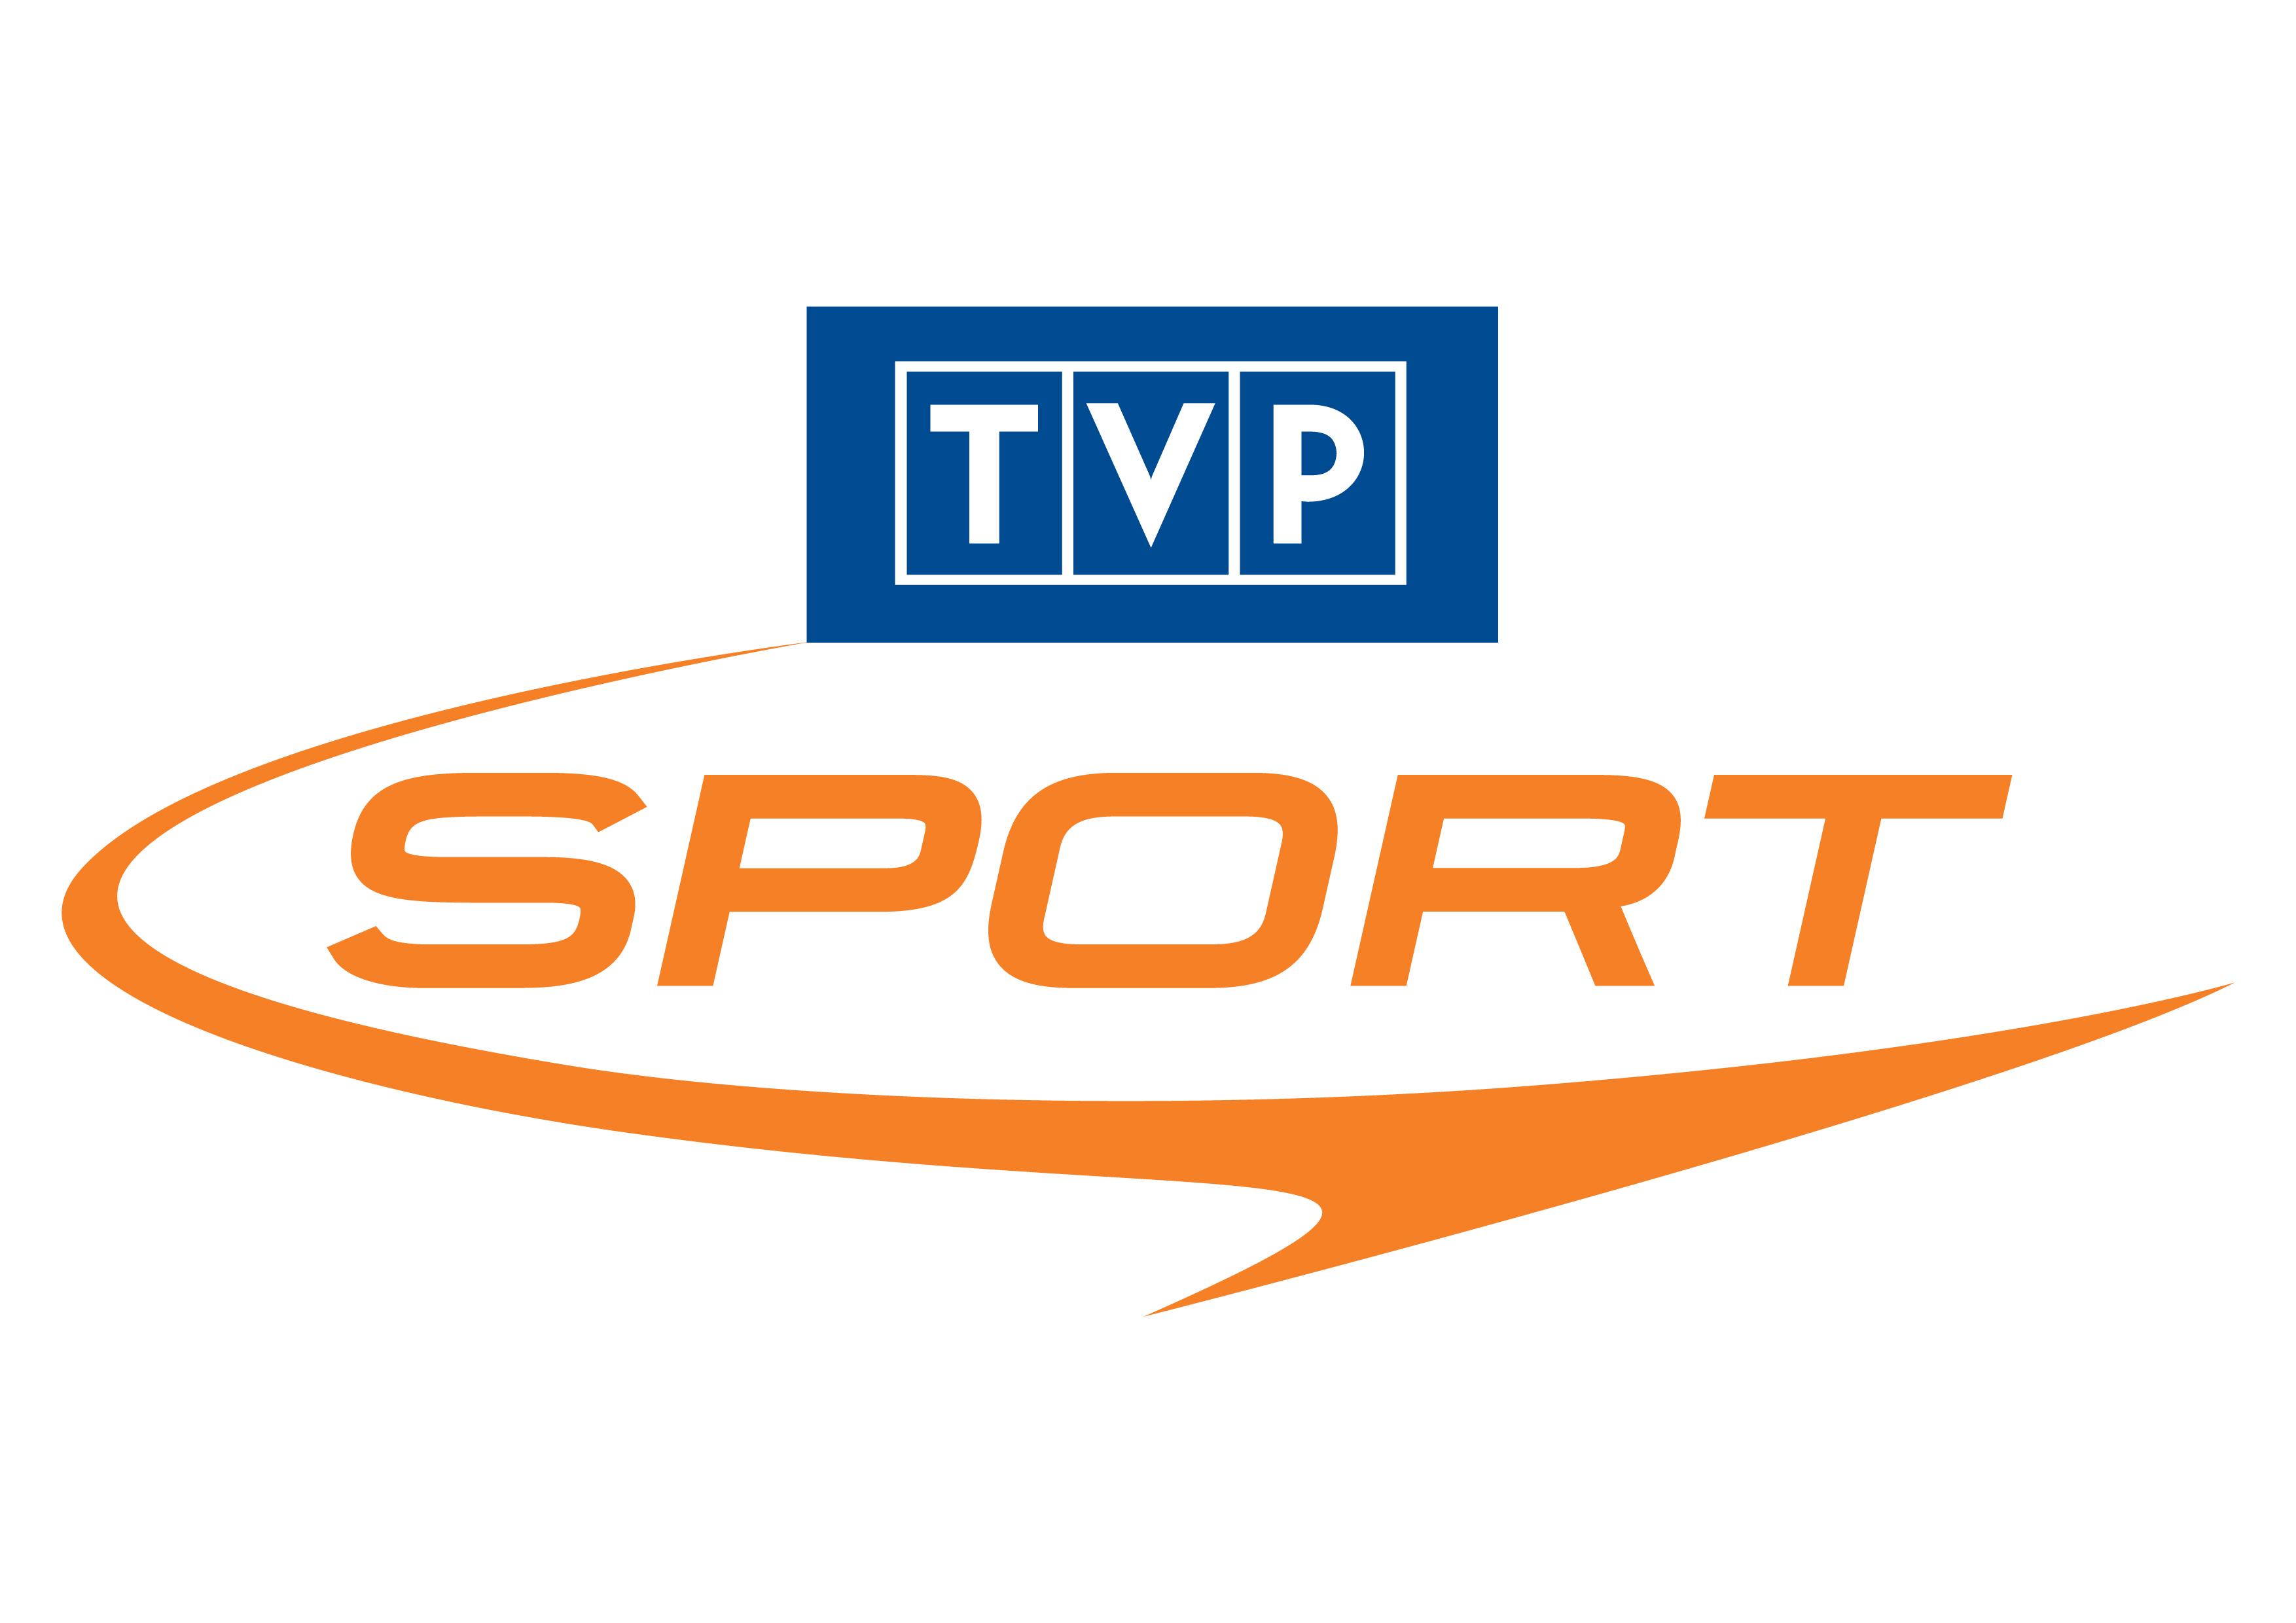 13.05.2020 Artykuł o Fanklubie w serwisie TVP SPORT